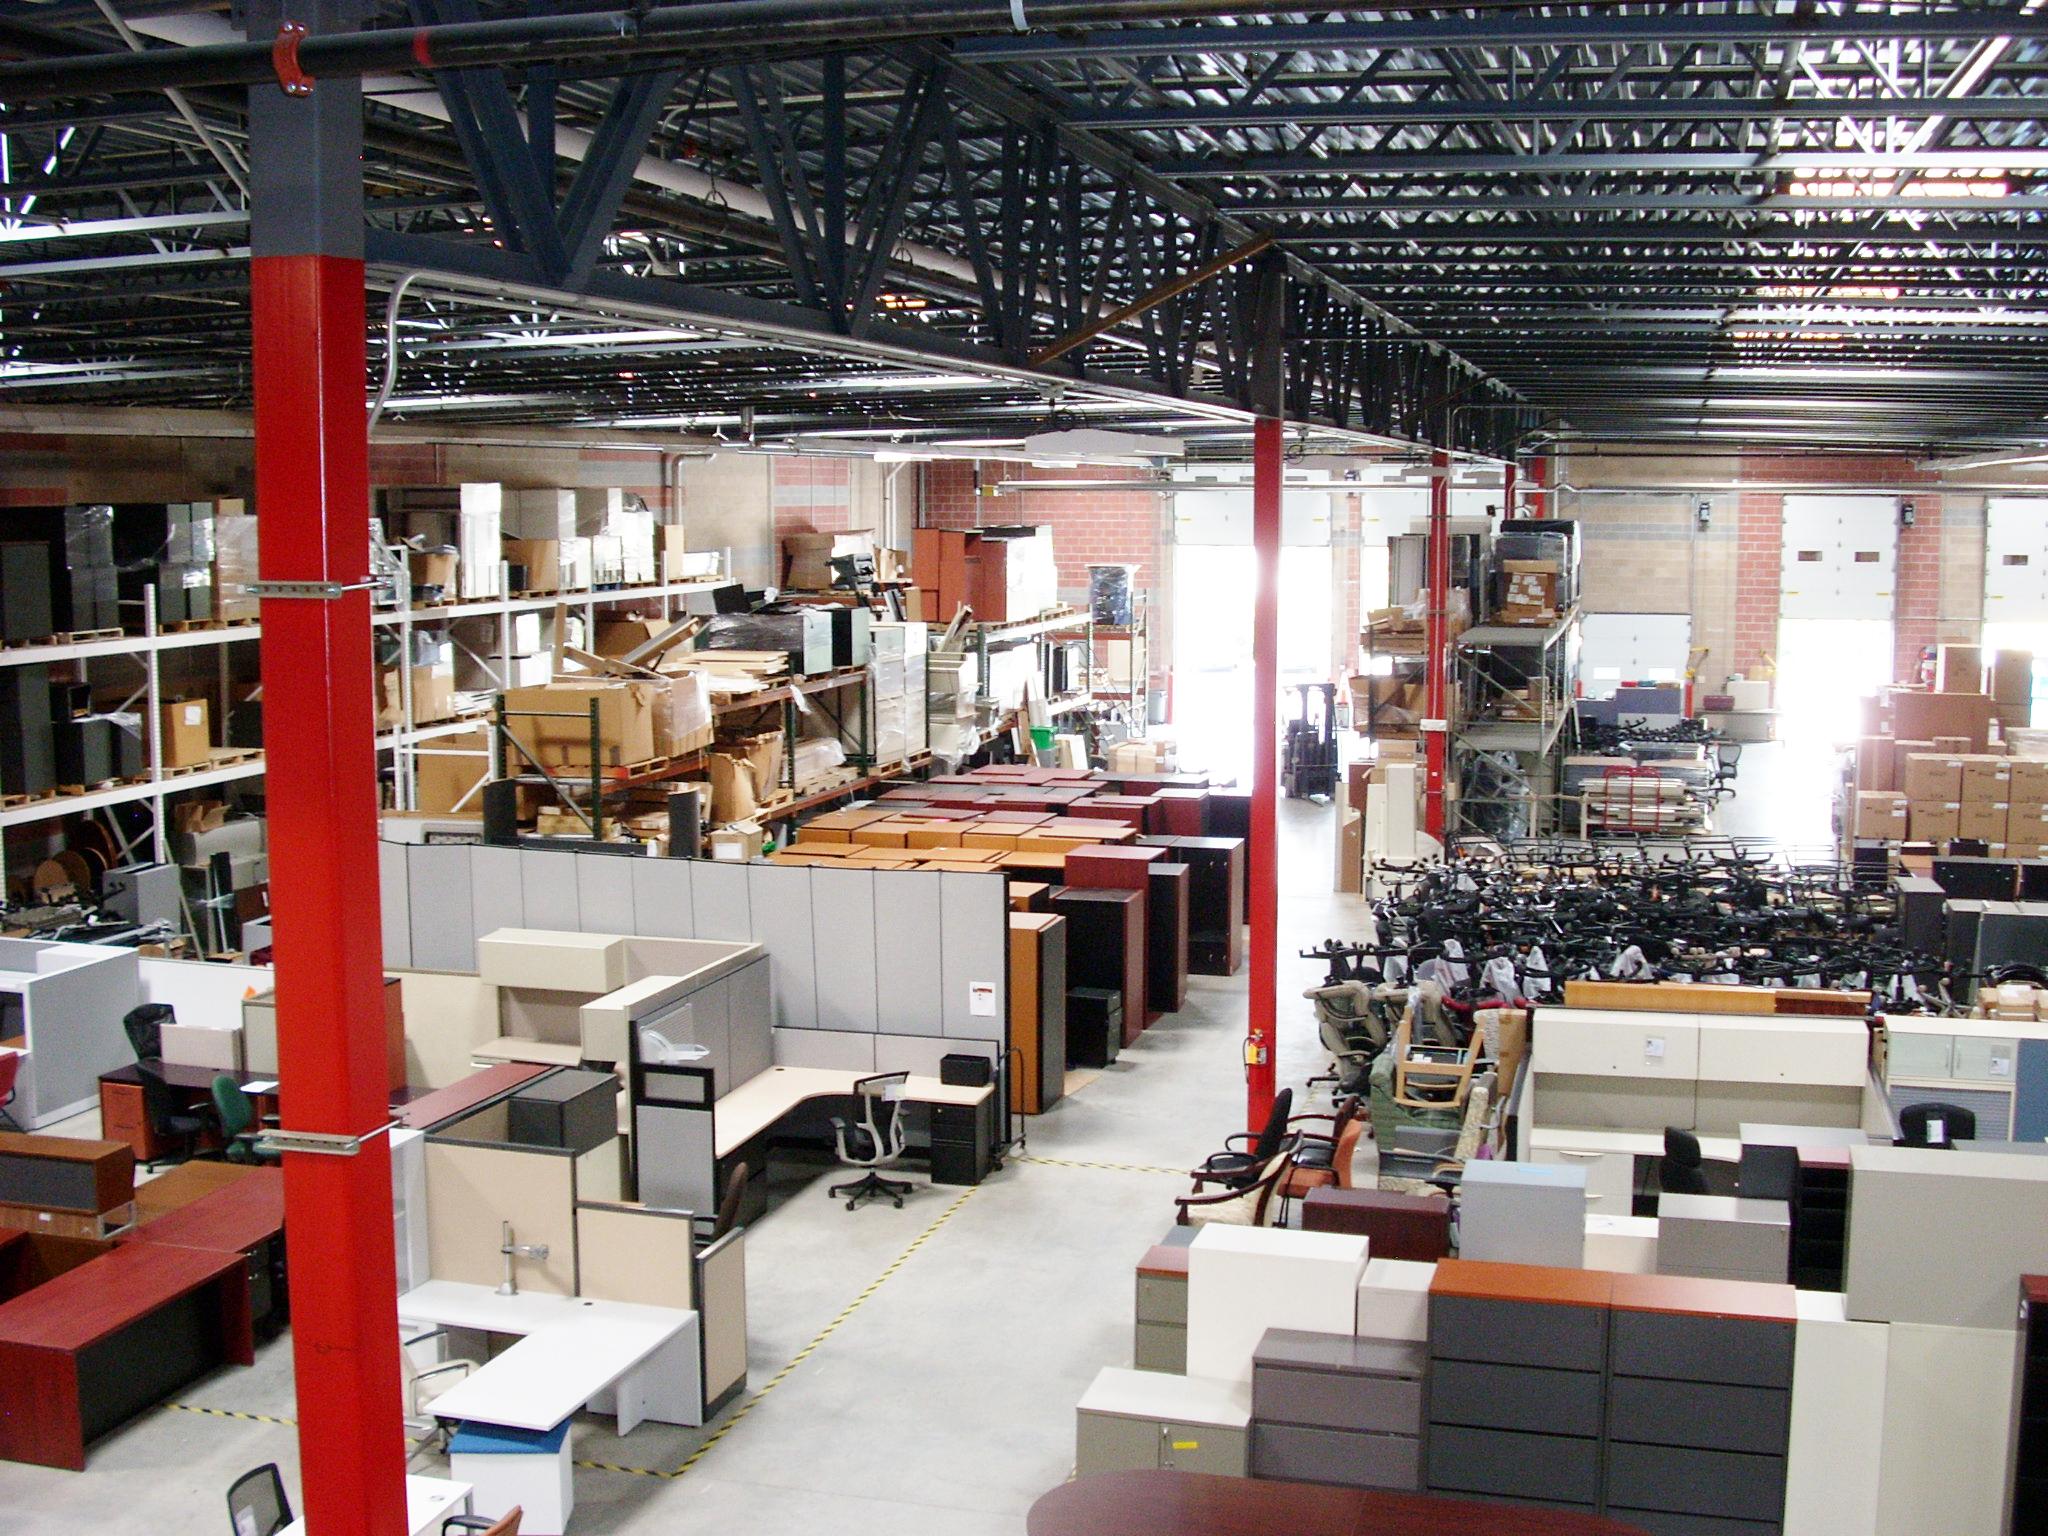 OSI Hag. Building, Trucks & Warehouse 034.JPG